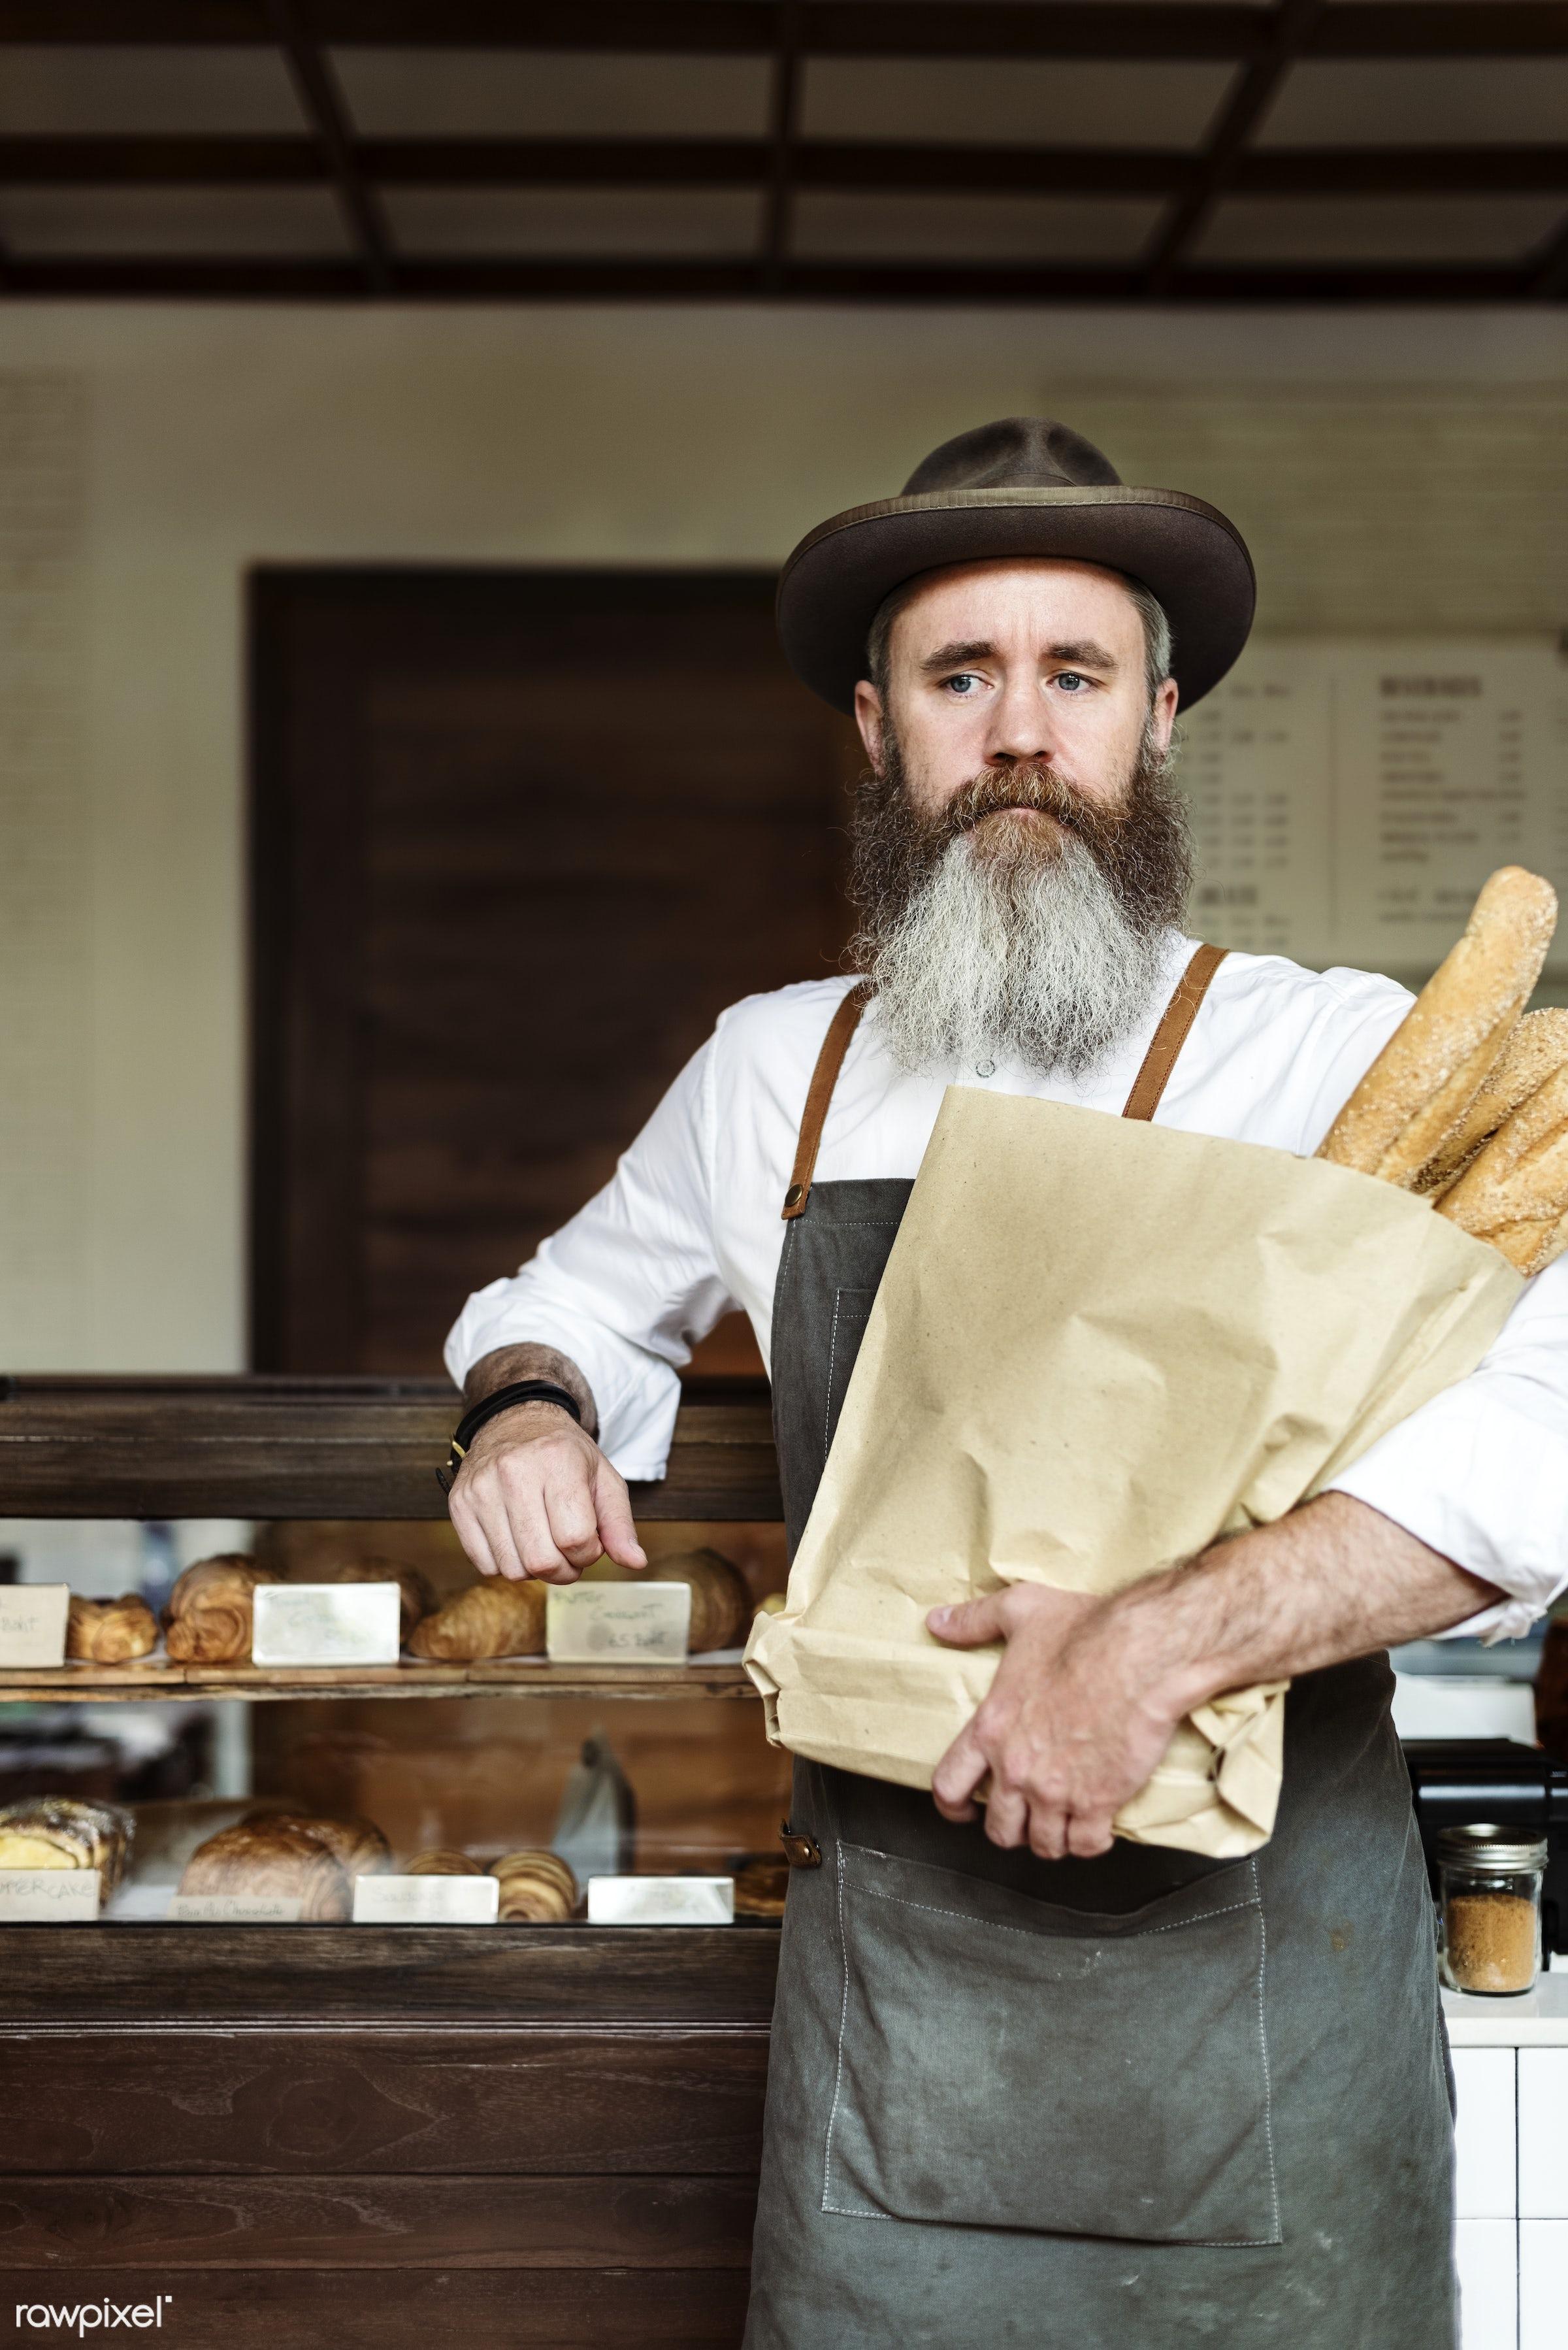 Caucasian barista man at coffee shop - apron, baguette, barista, beverage, bread, career, caucasian, cheerful, coffee,...